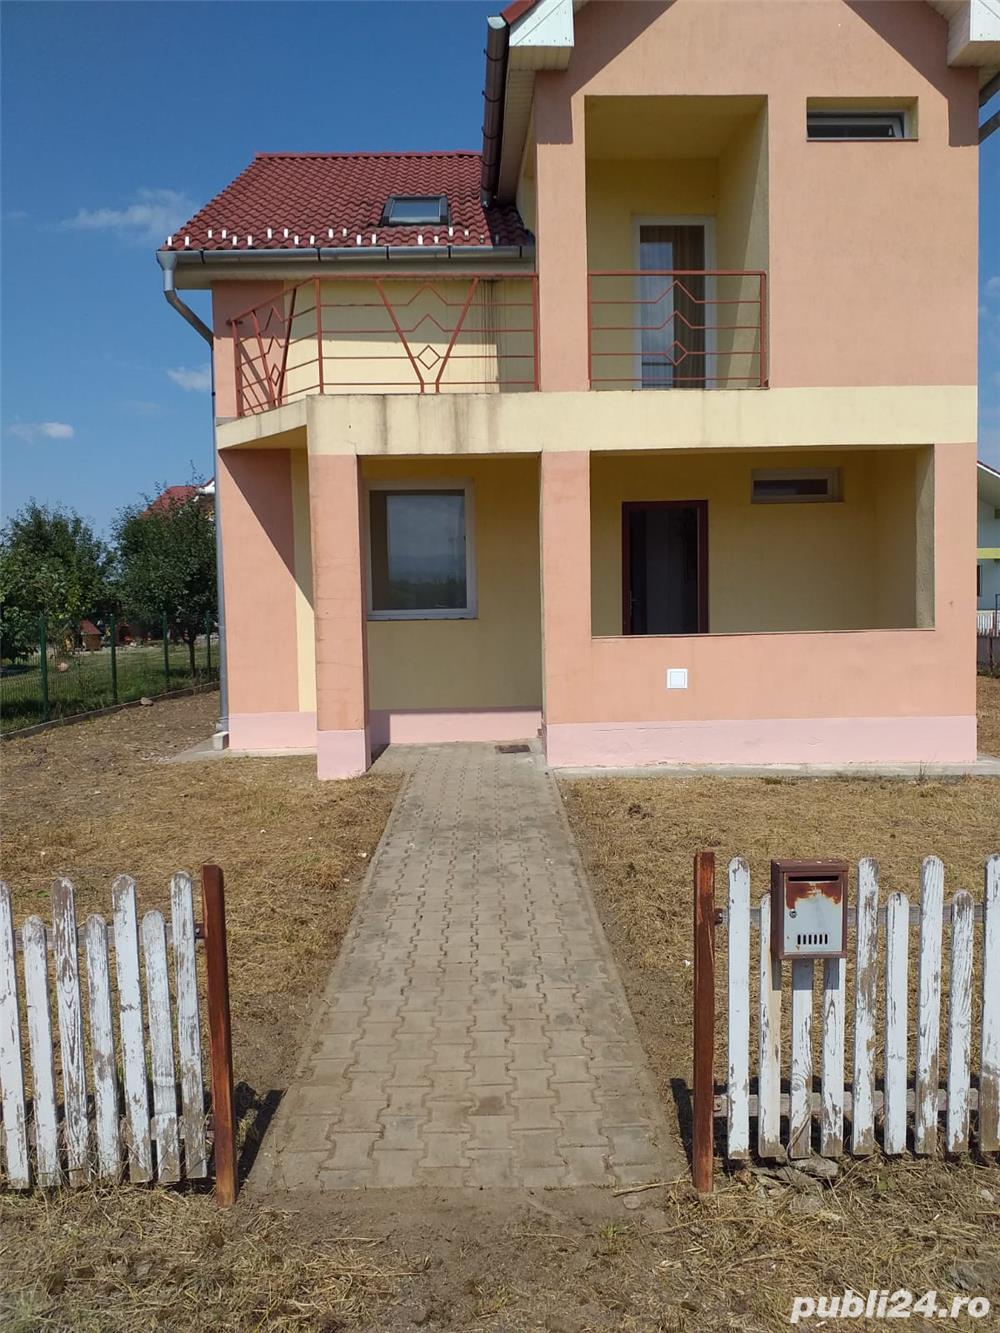 Oferta!!!Vind casa in Sura Mica(Sibiu)cartierul Eden 75000 €uro